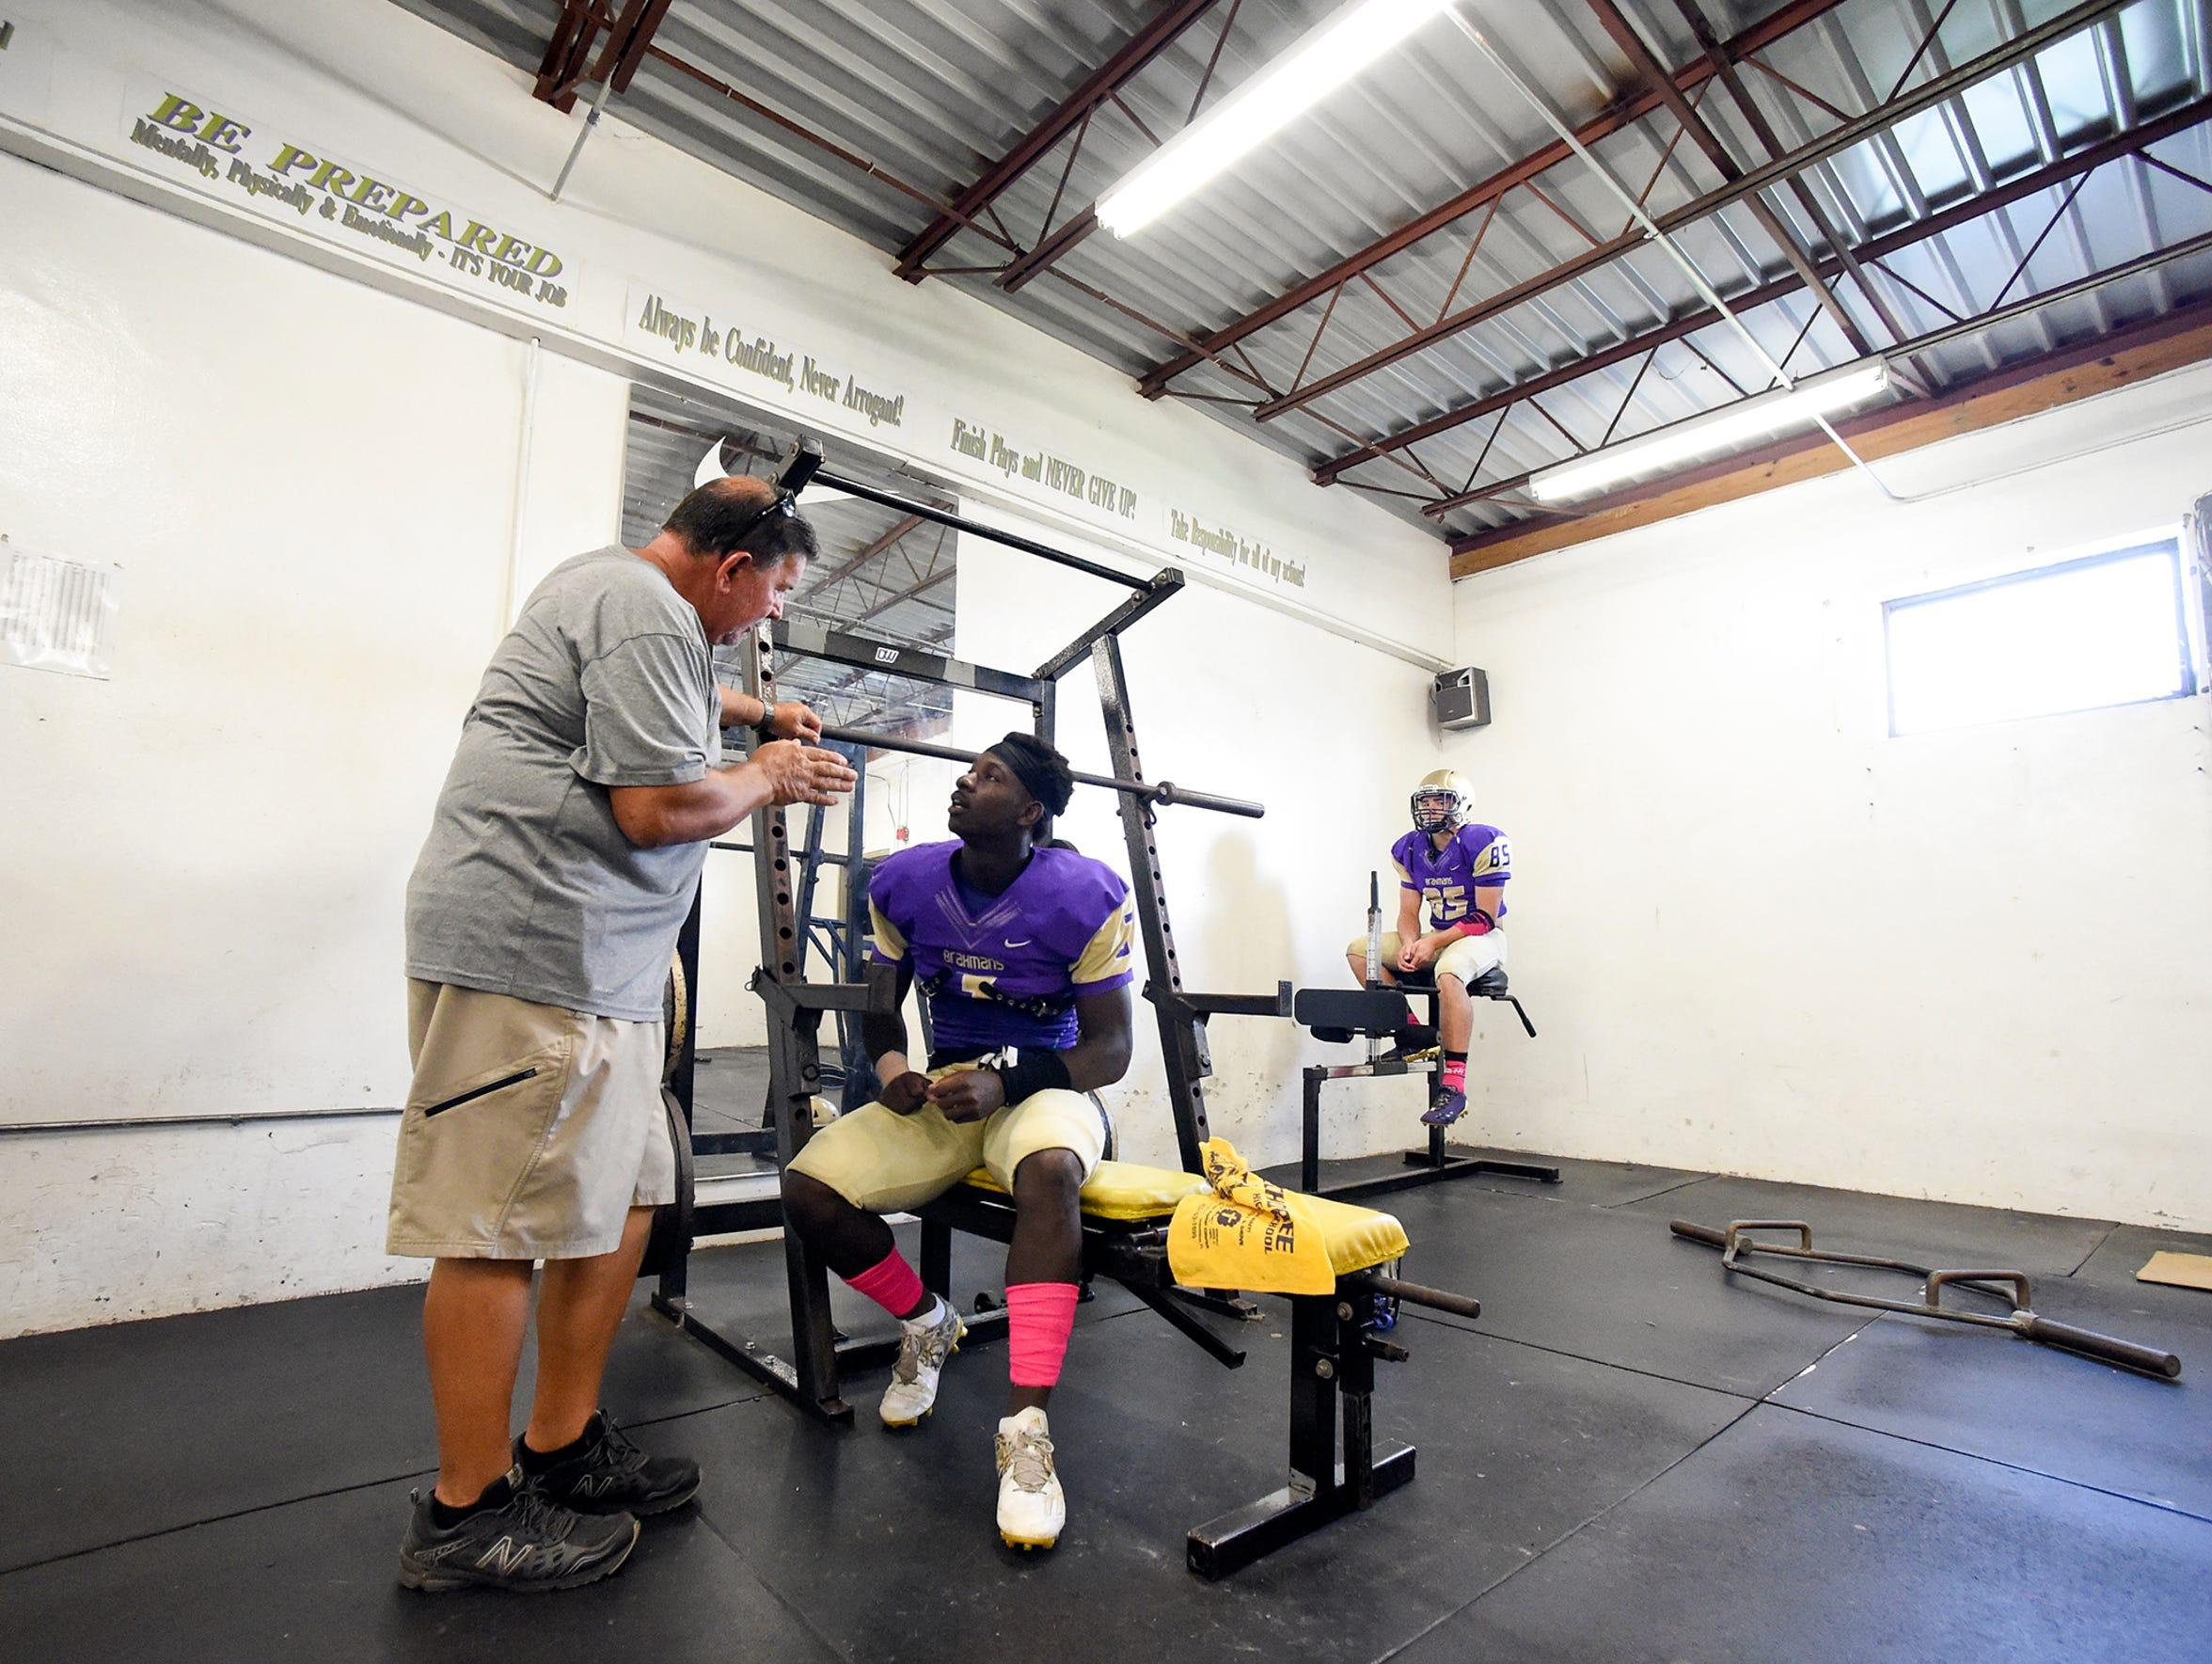 Okeechobee High School assistant coach Glenn Attaway